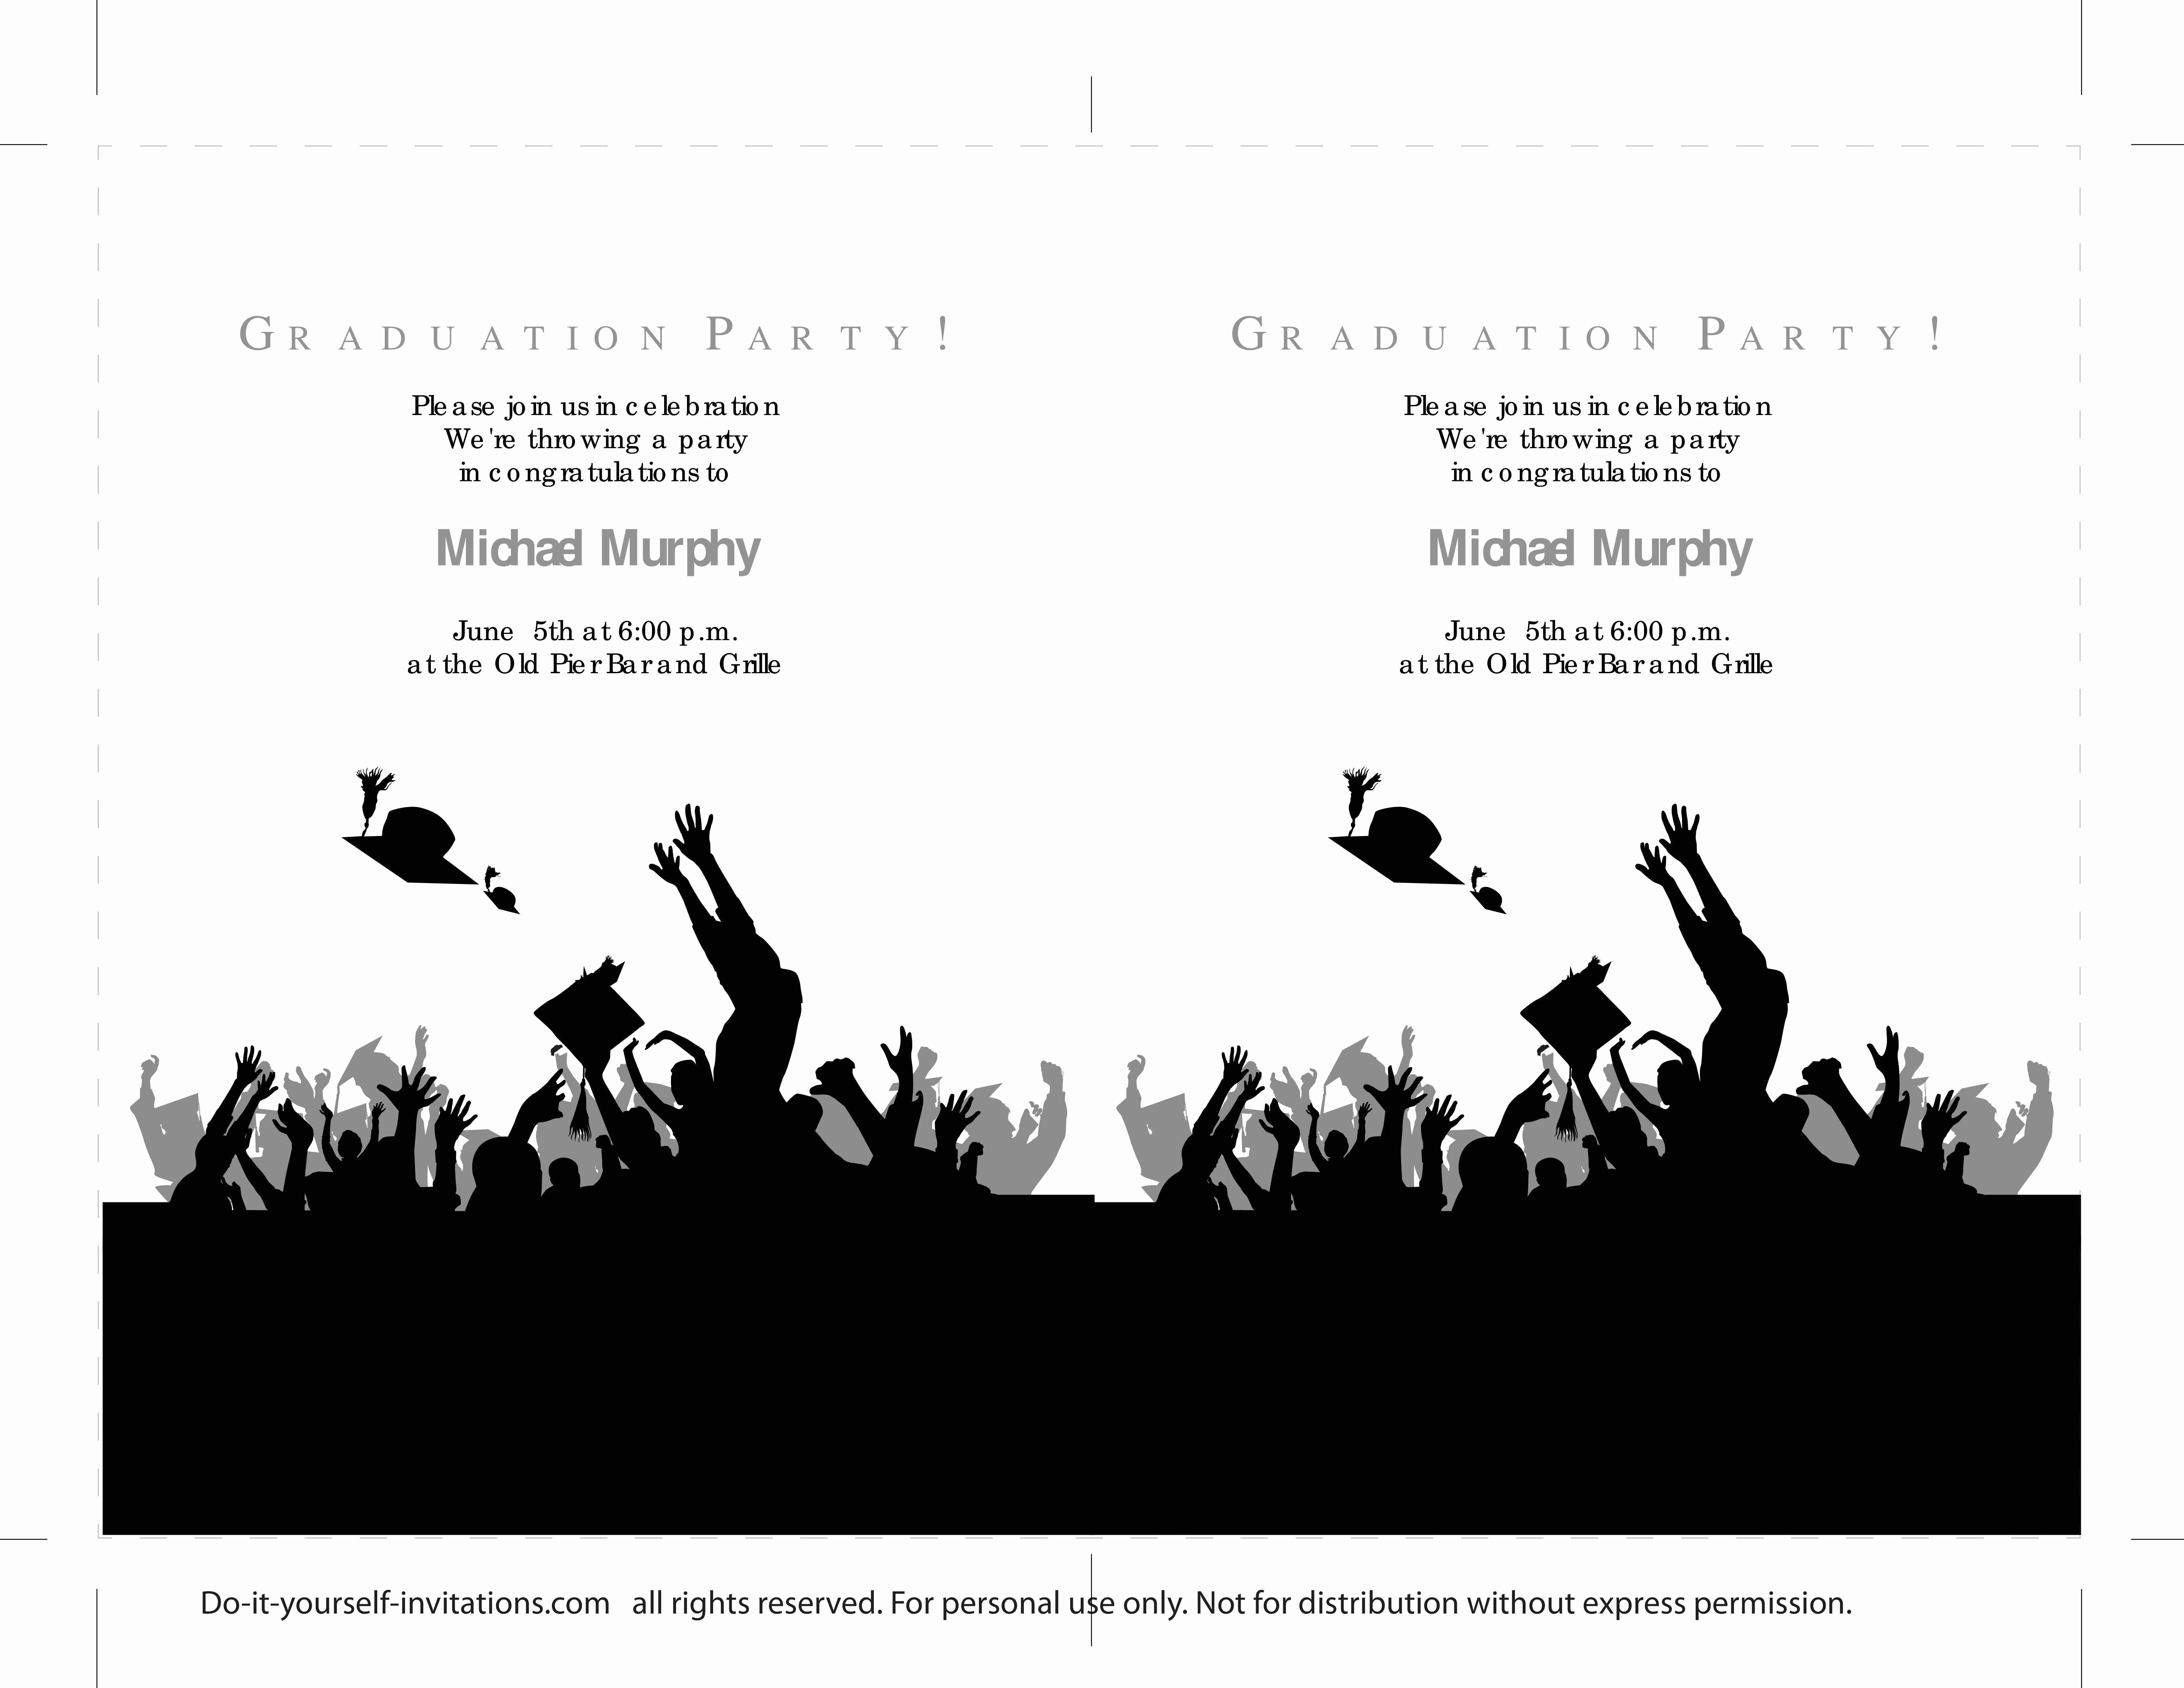 Free Graduation Party Invitation Templates Awesome 40 Free Graduation Invitation Templates Template Lab